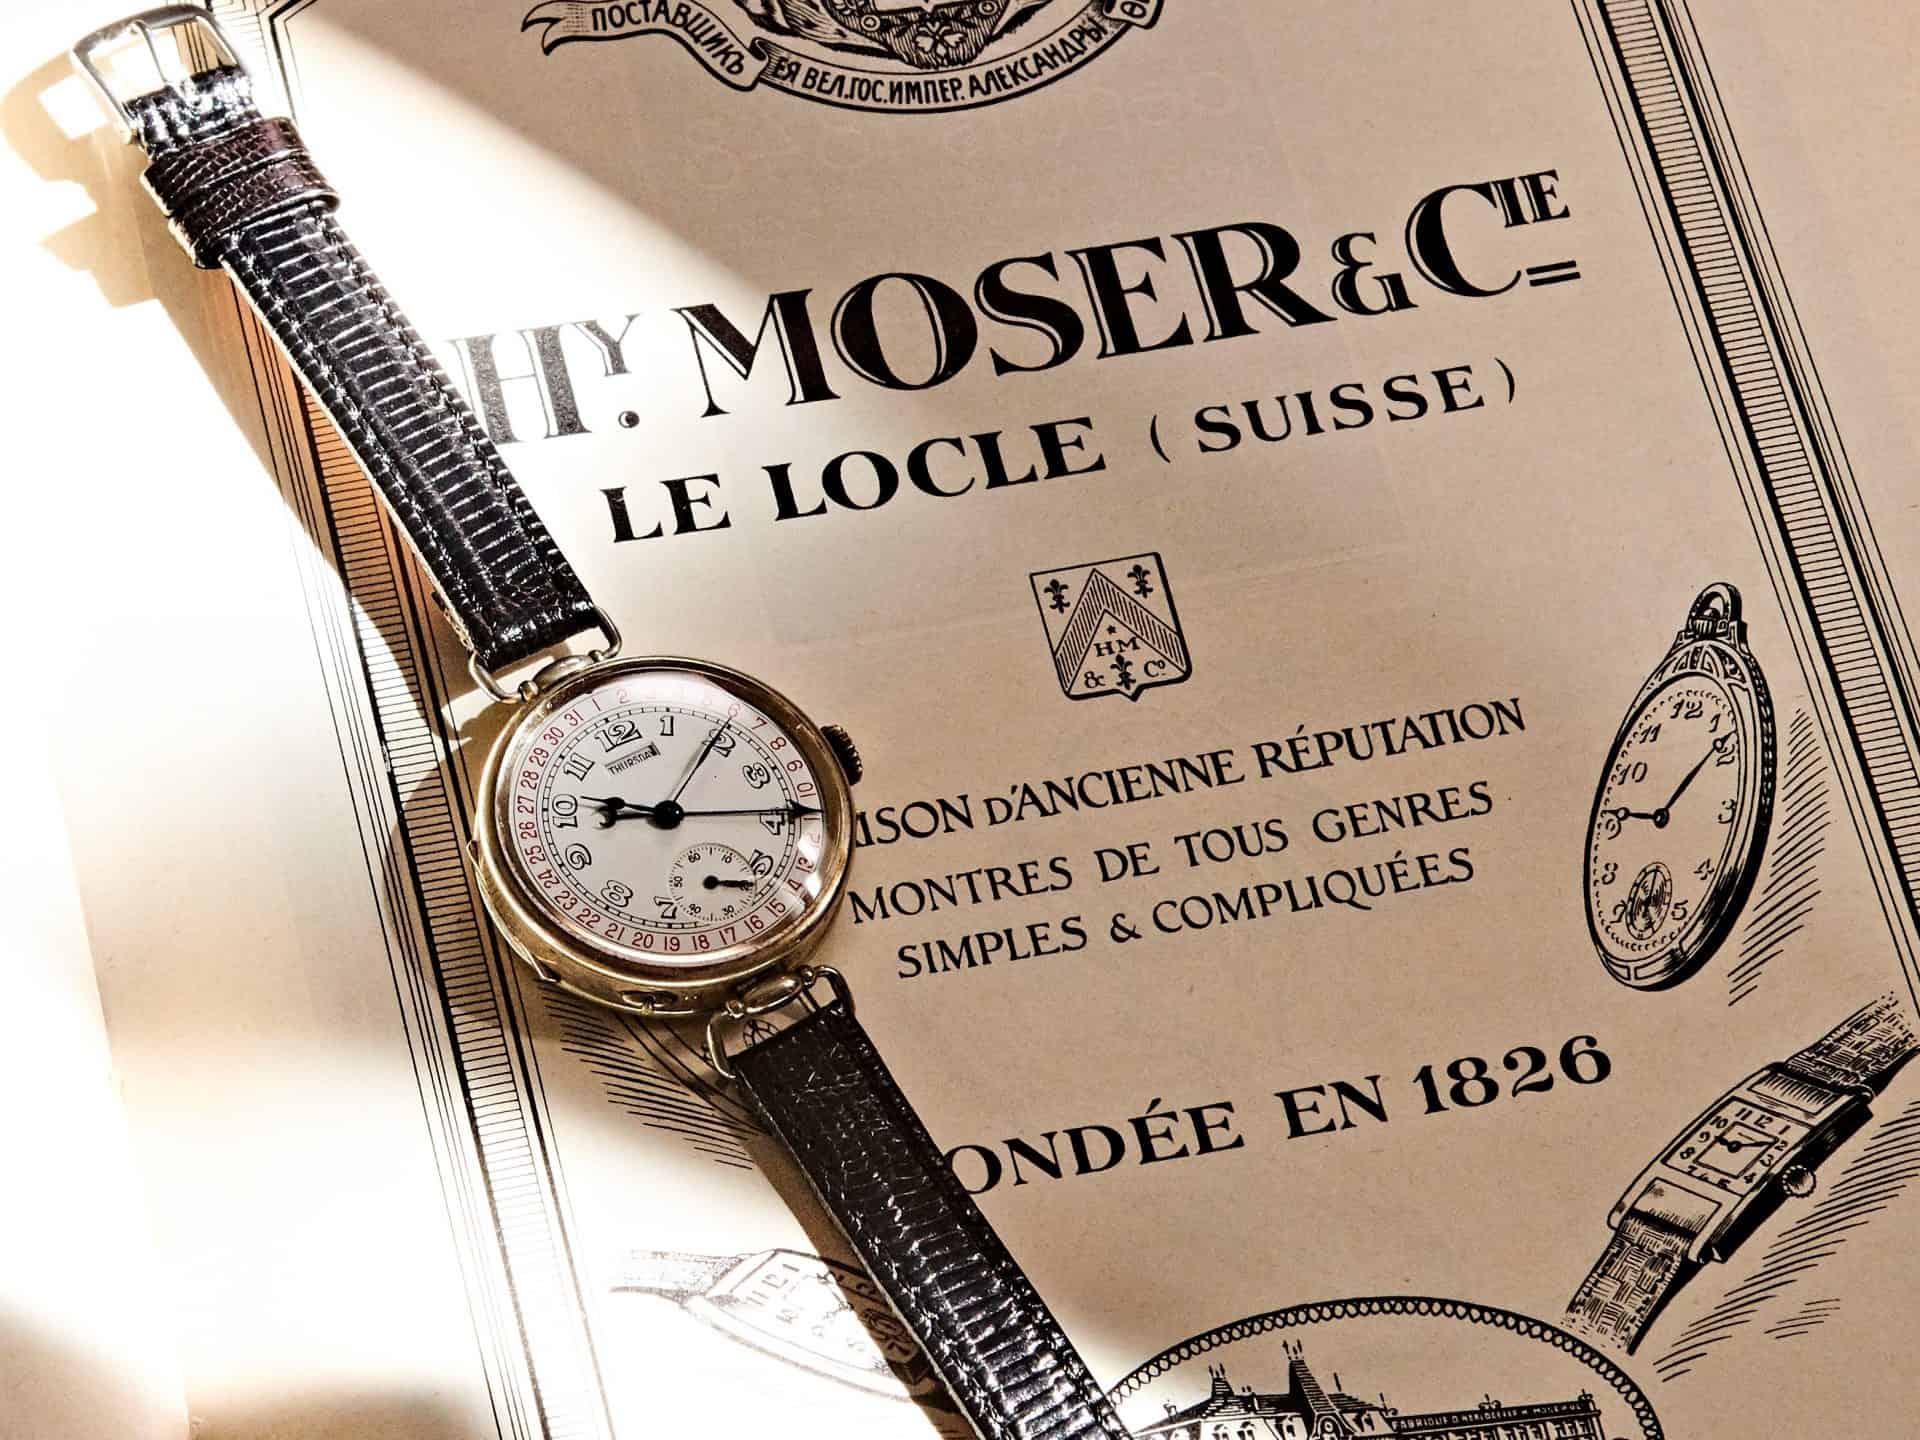 Moser Kalender Vintage Armbanduhr (c) Uhrenkosmos